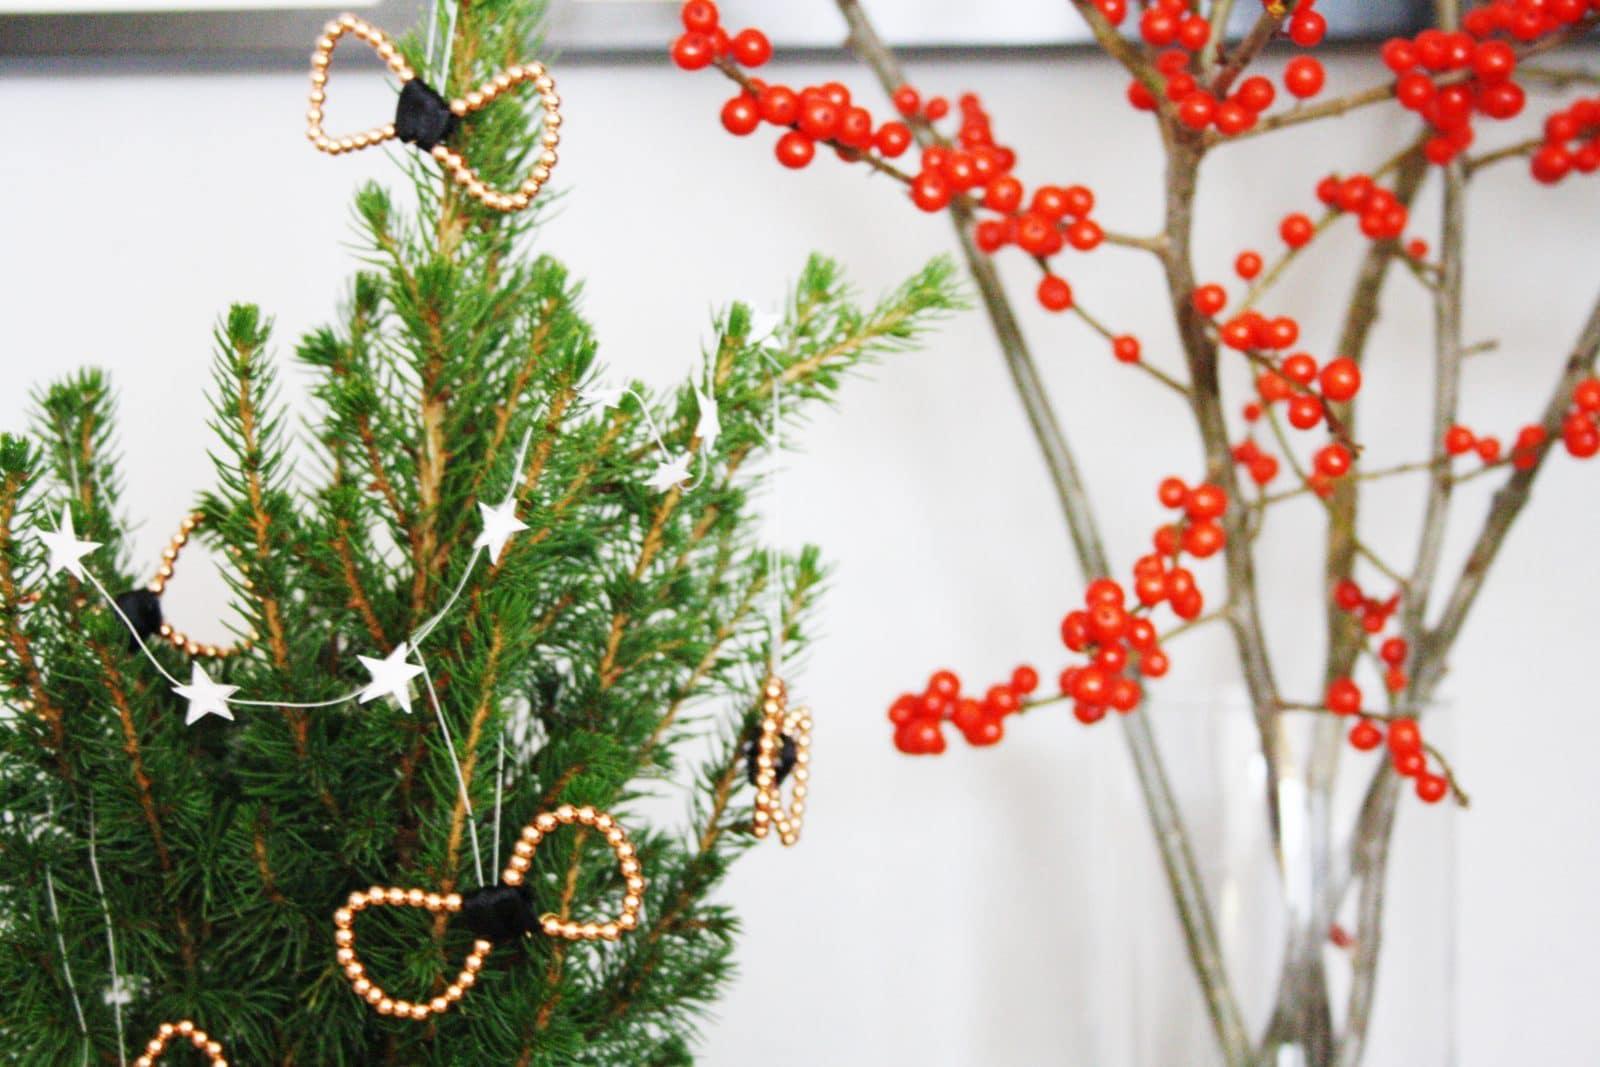 schmuck f r den weihnachtsbaum diy handmade kultur. Black Bedroom Furniture Sets. Home Design Ideas